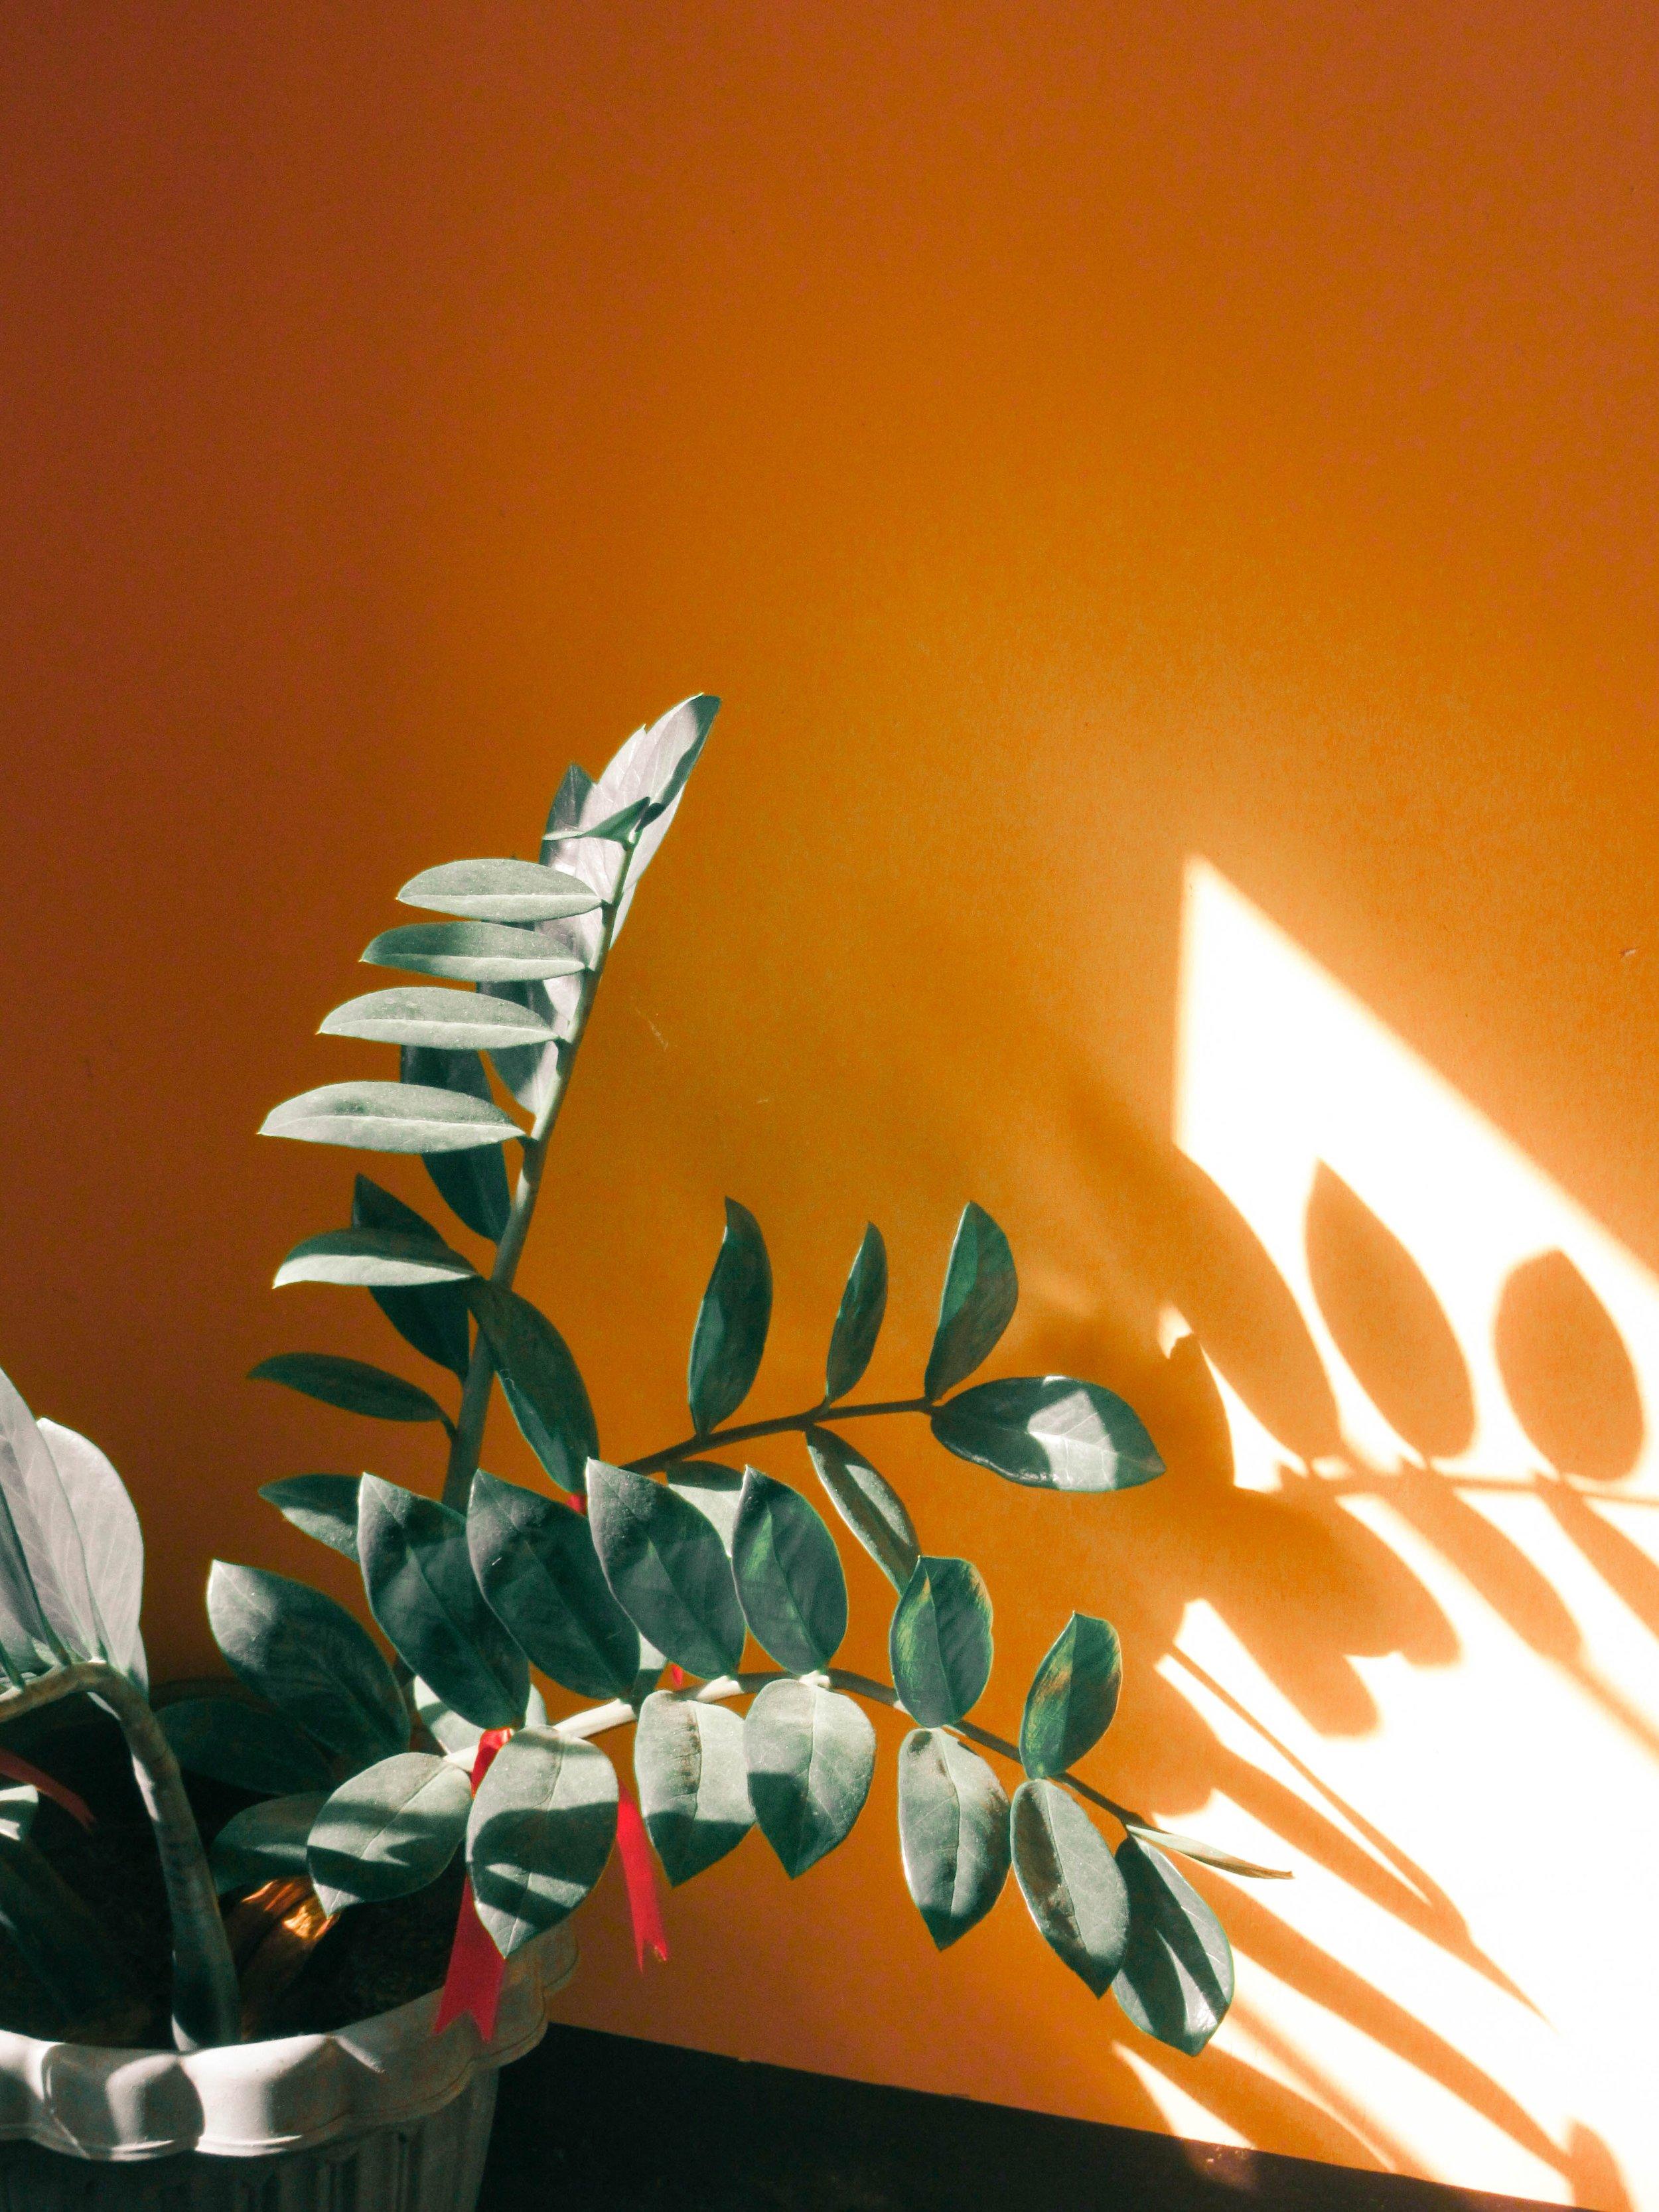 light-orange-plant-824572.jpg